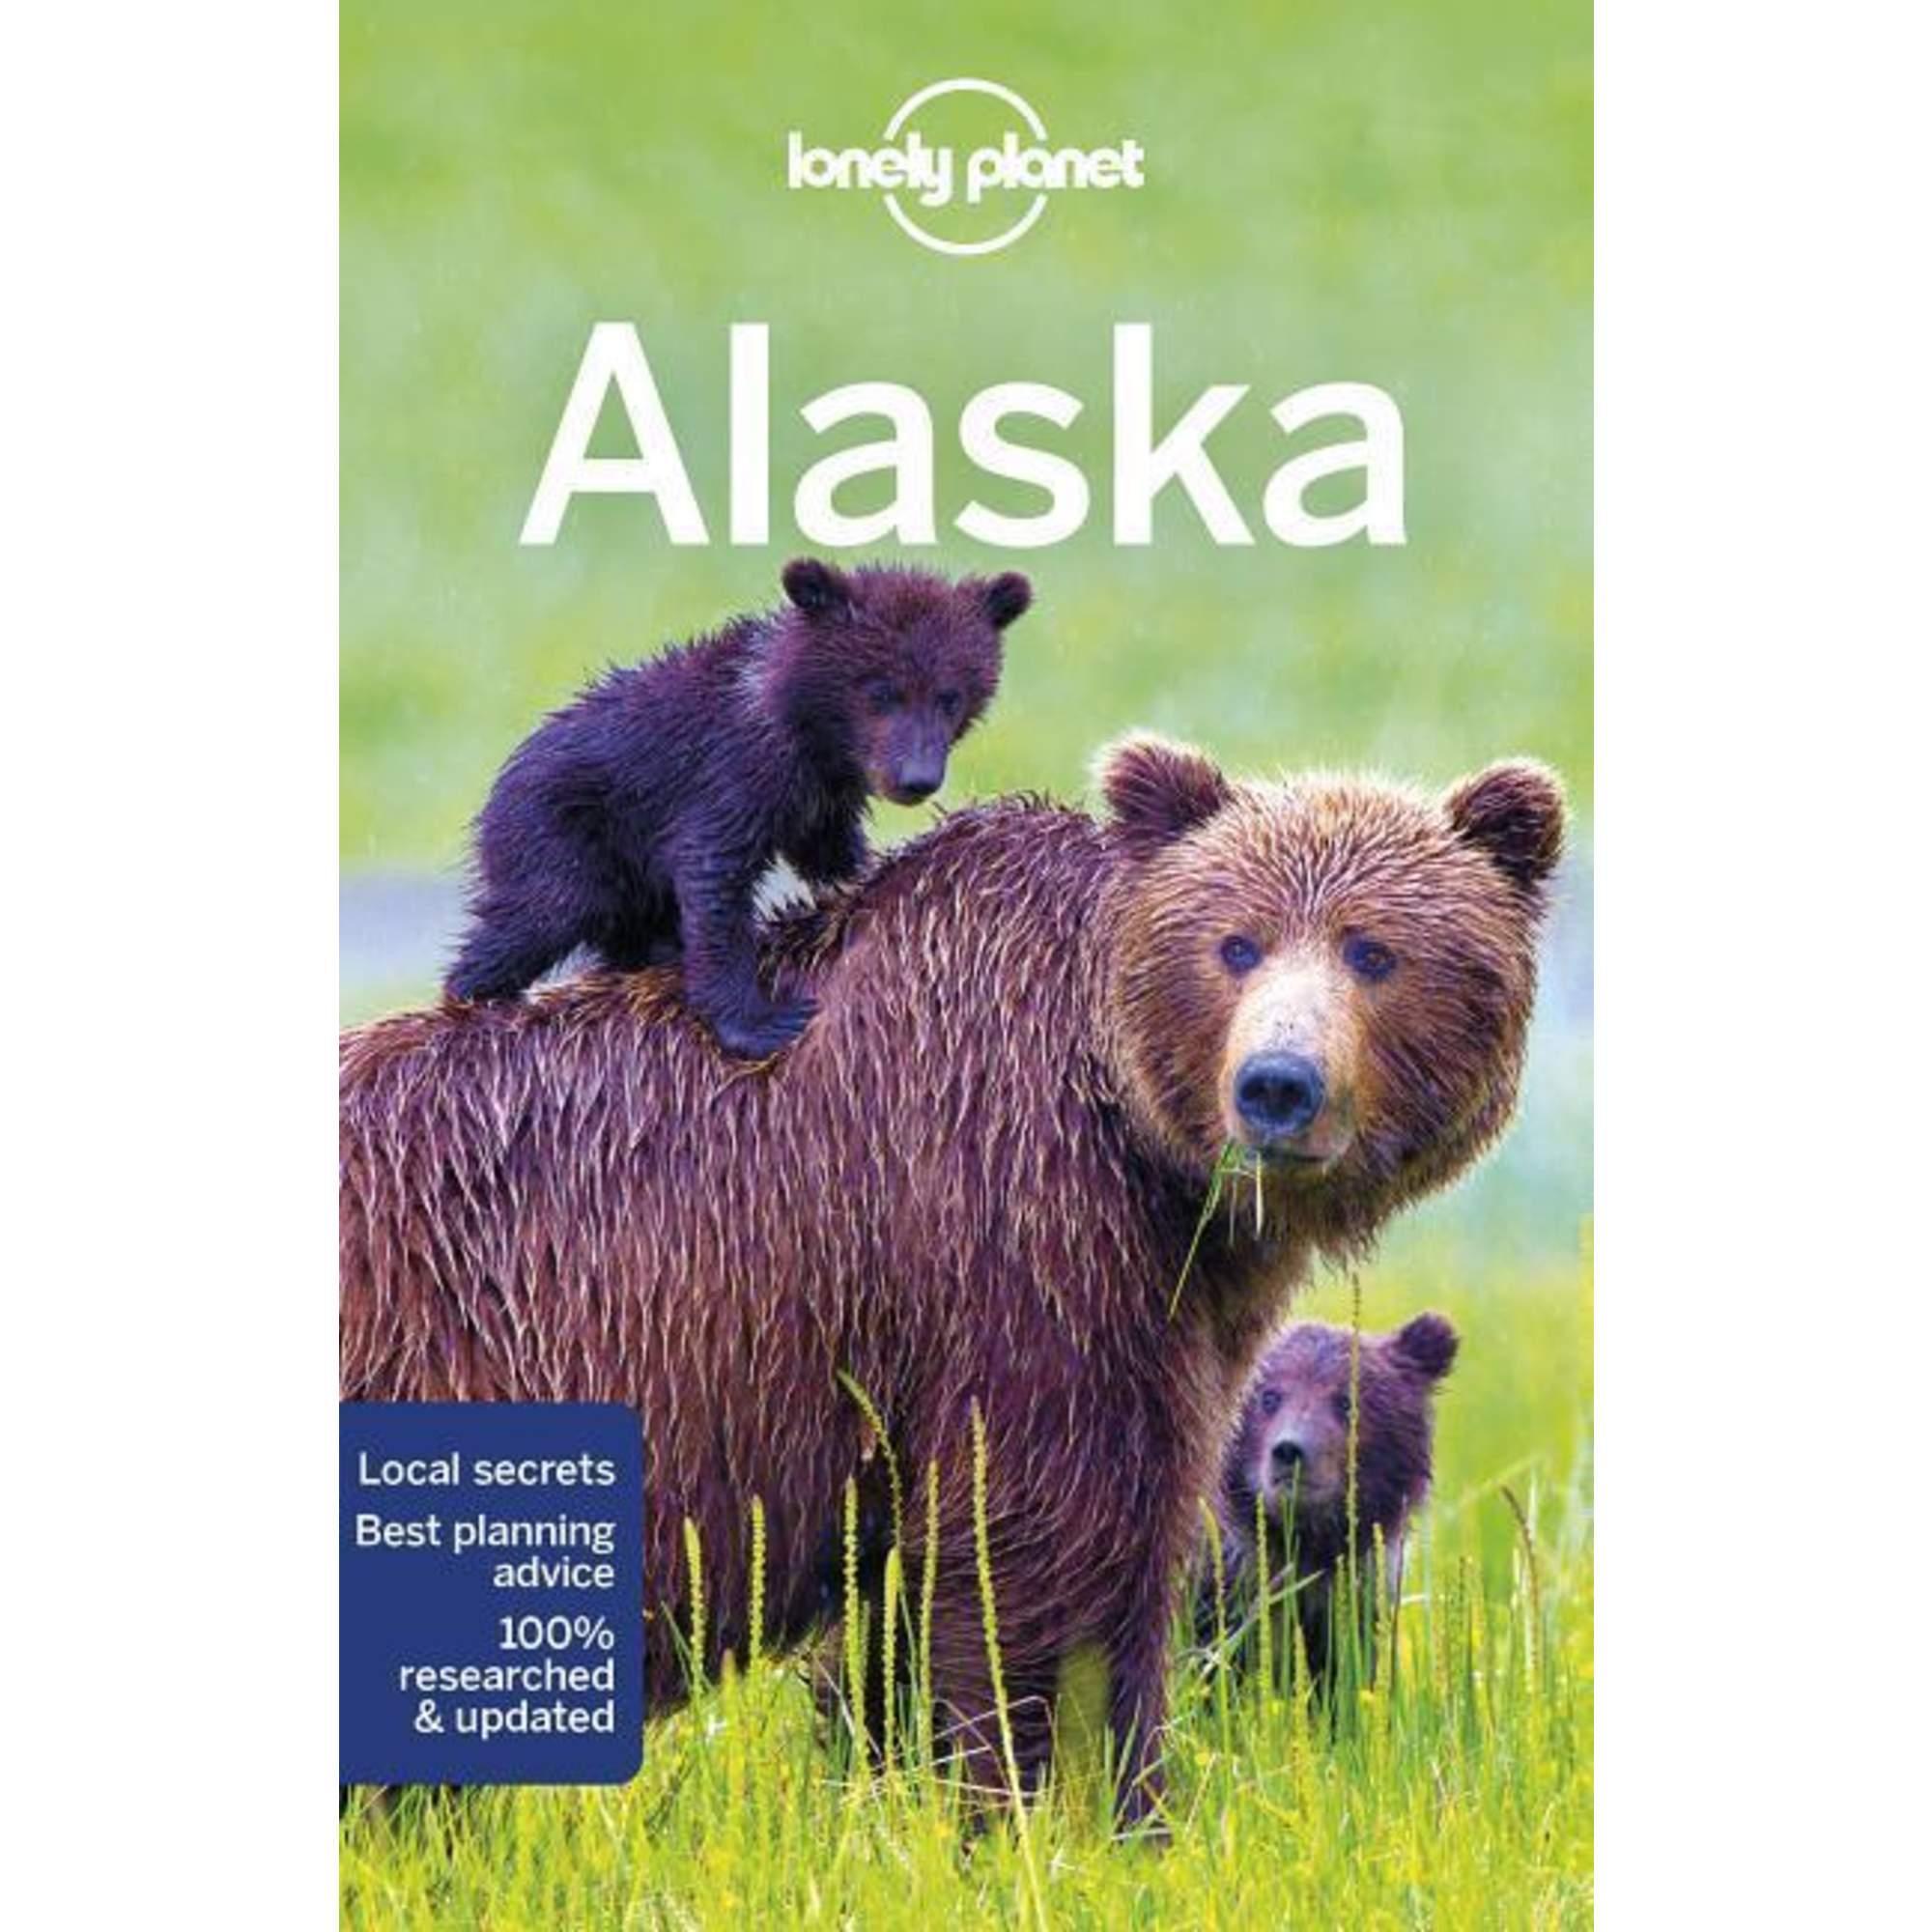 Alaska Regional Guide, 21,90 Euro